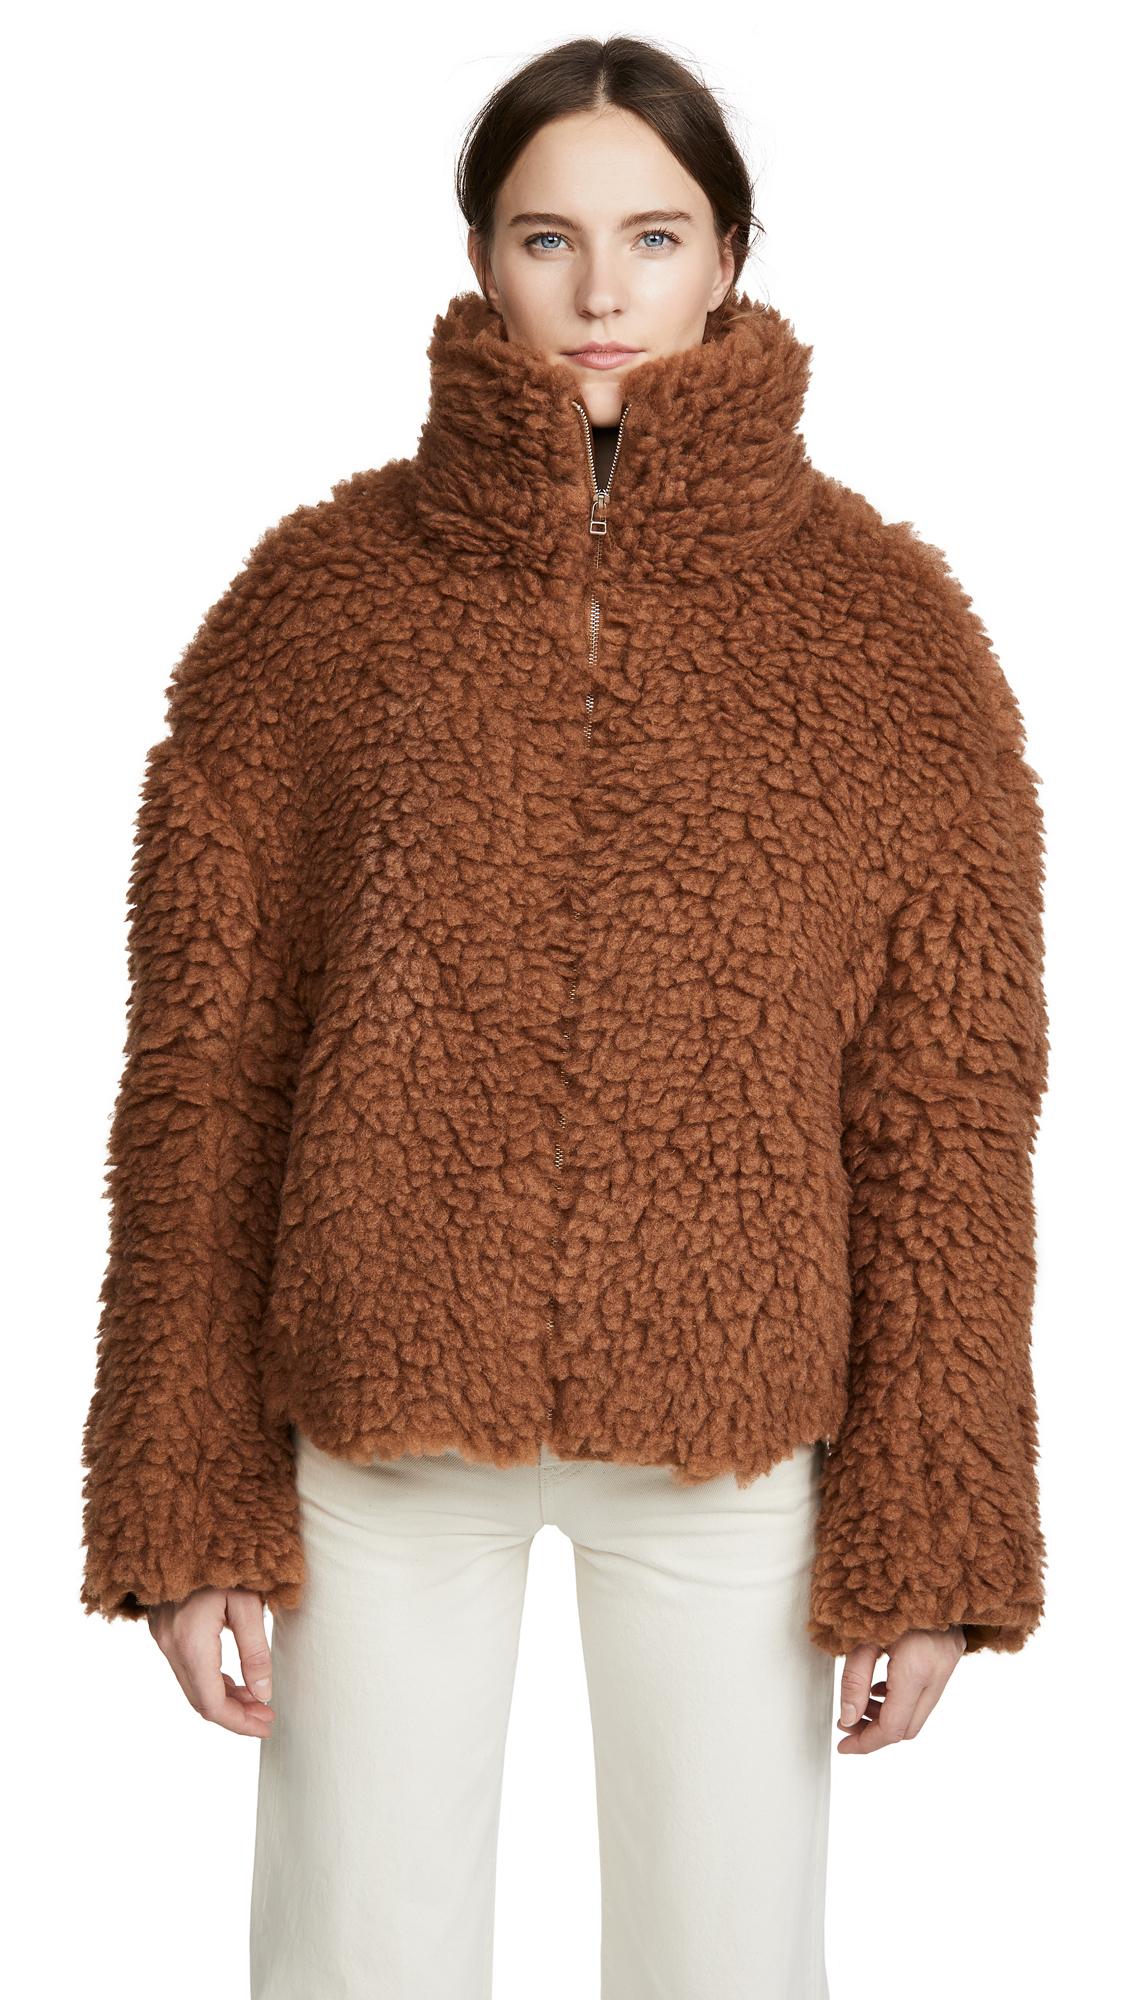 Buy Eckhaus Latta Yeti Jacket online beautiful Eckhaus Latta Jackets, Coats, Down Jackets